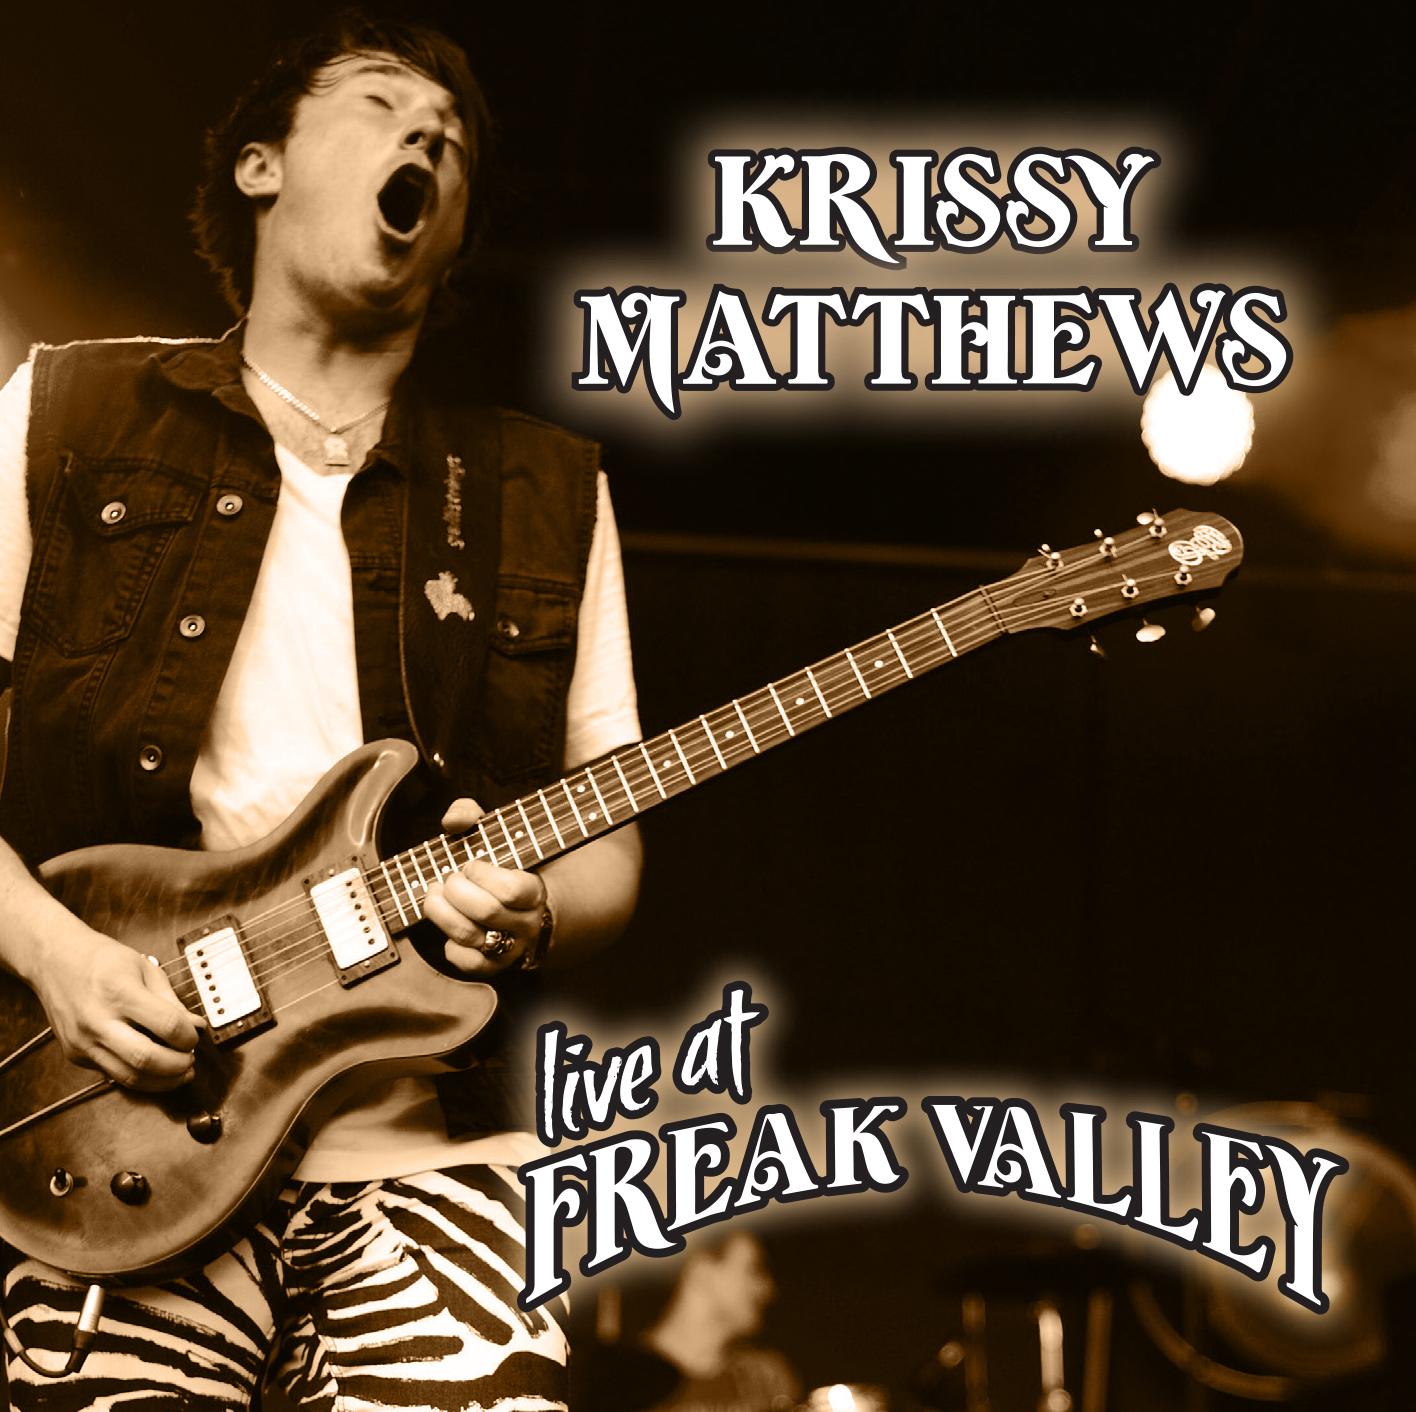 Krissy Matthews